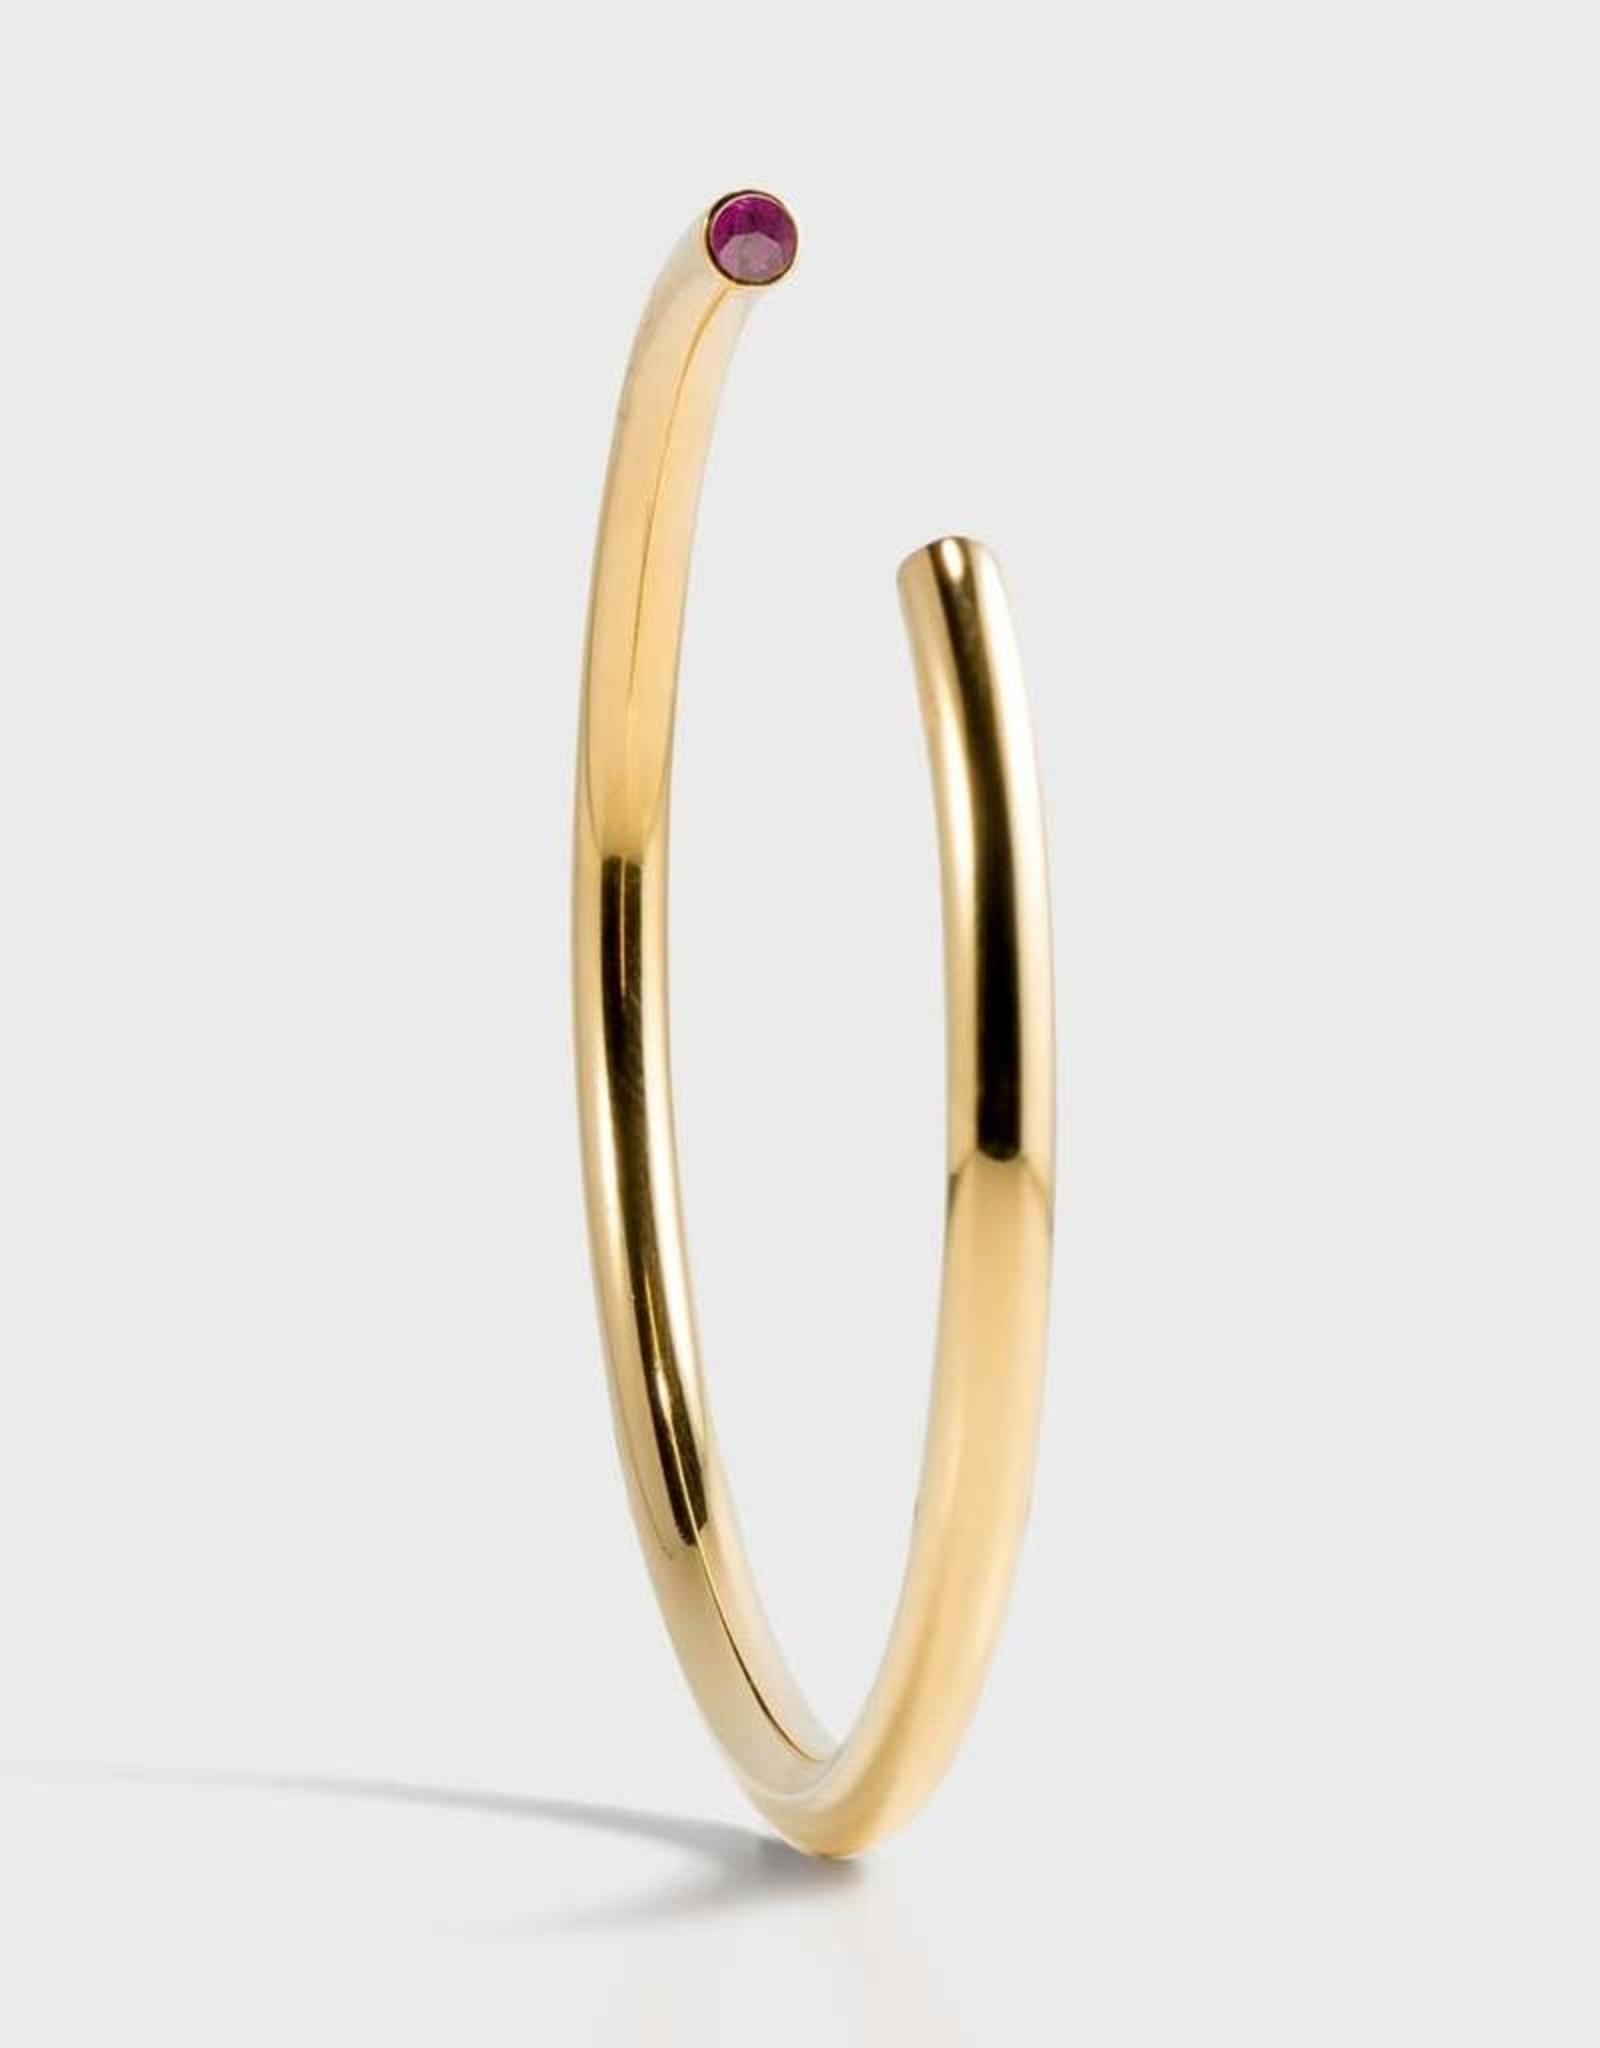 Stella Vale Birthstone Bracelet - February/Gold